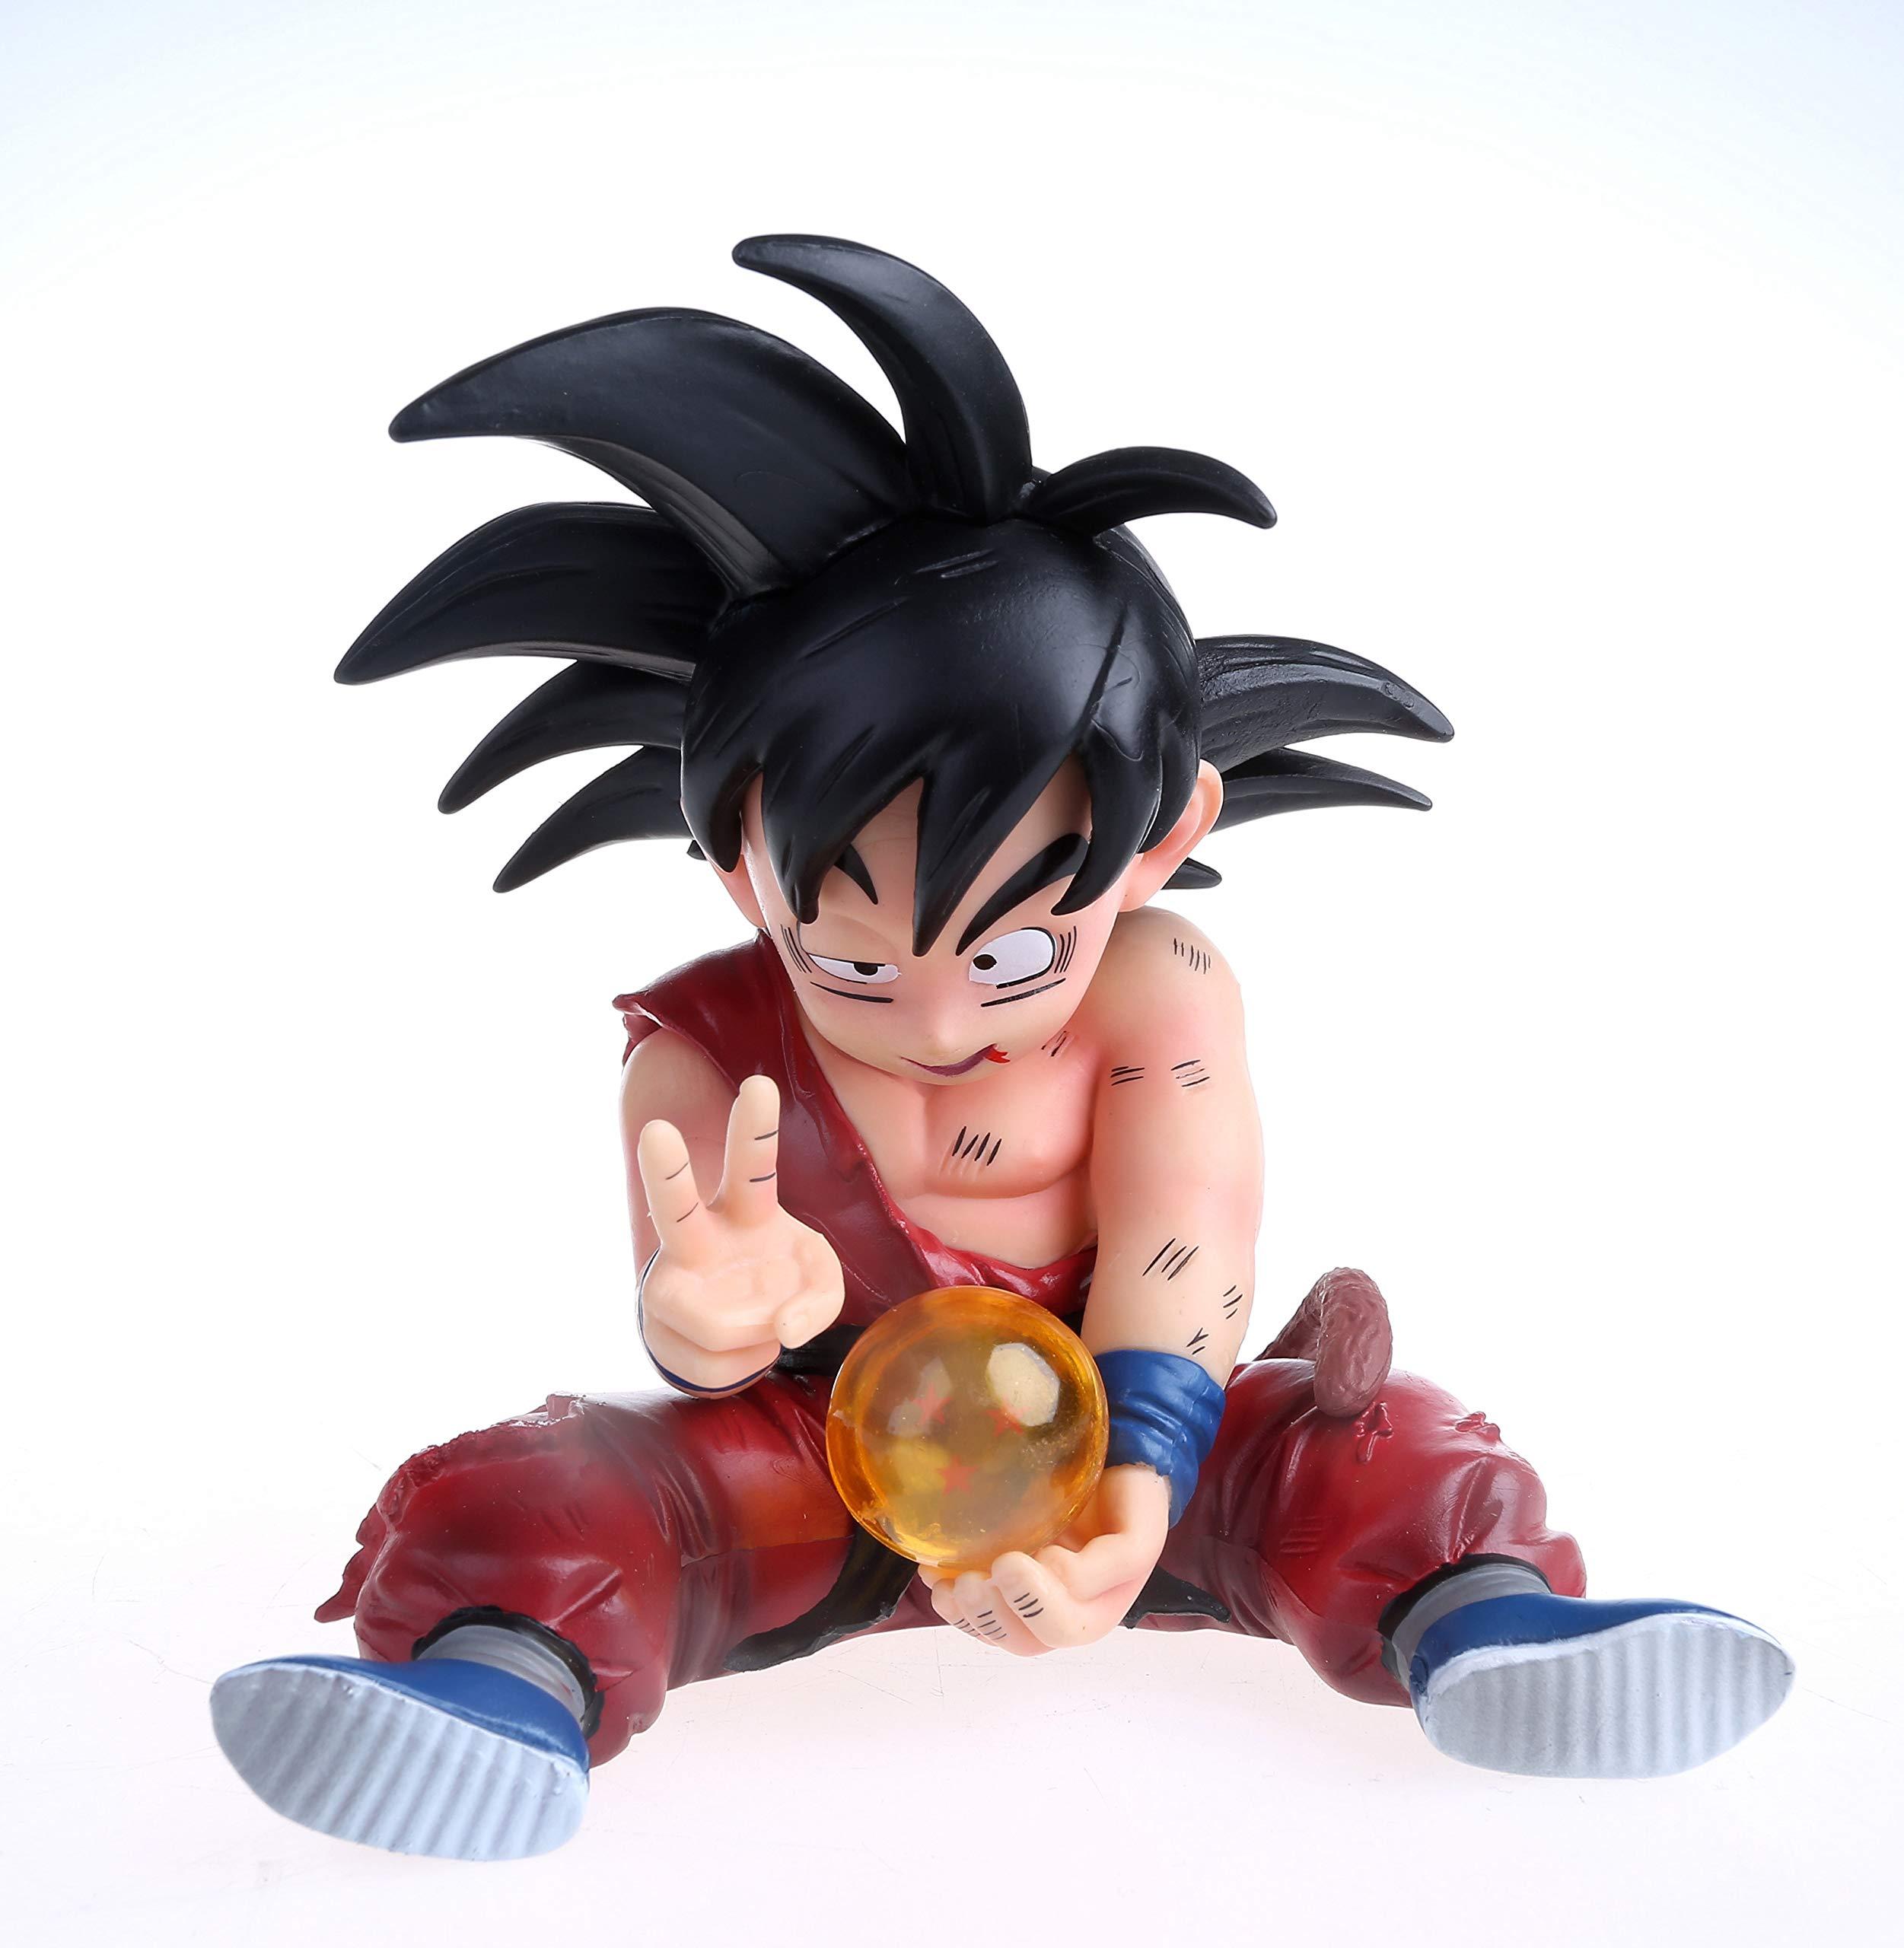 KELAKE Dragon Ball Z Actions Figures DBZ Super Saiyan Goku Figure Statue Figurine Model Doll Collection Birthday Gifts PVC - 5 Inch